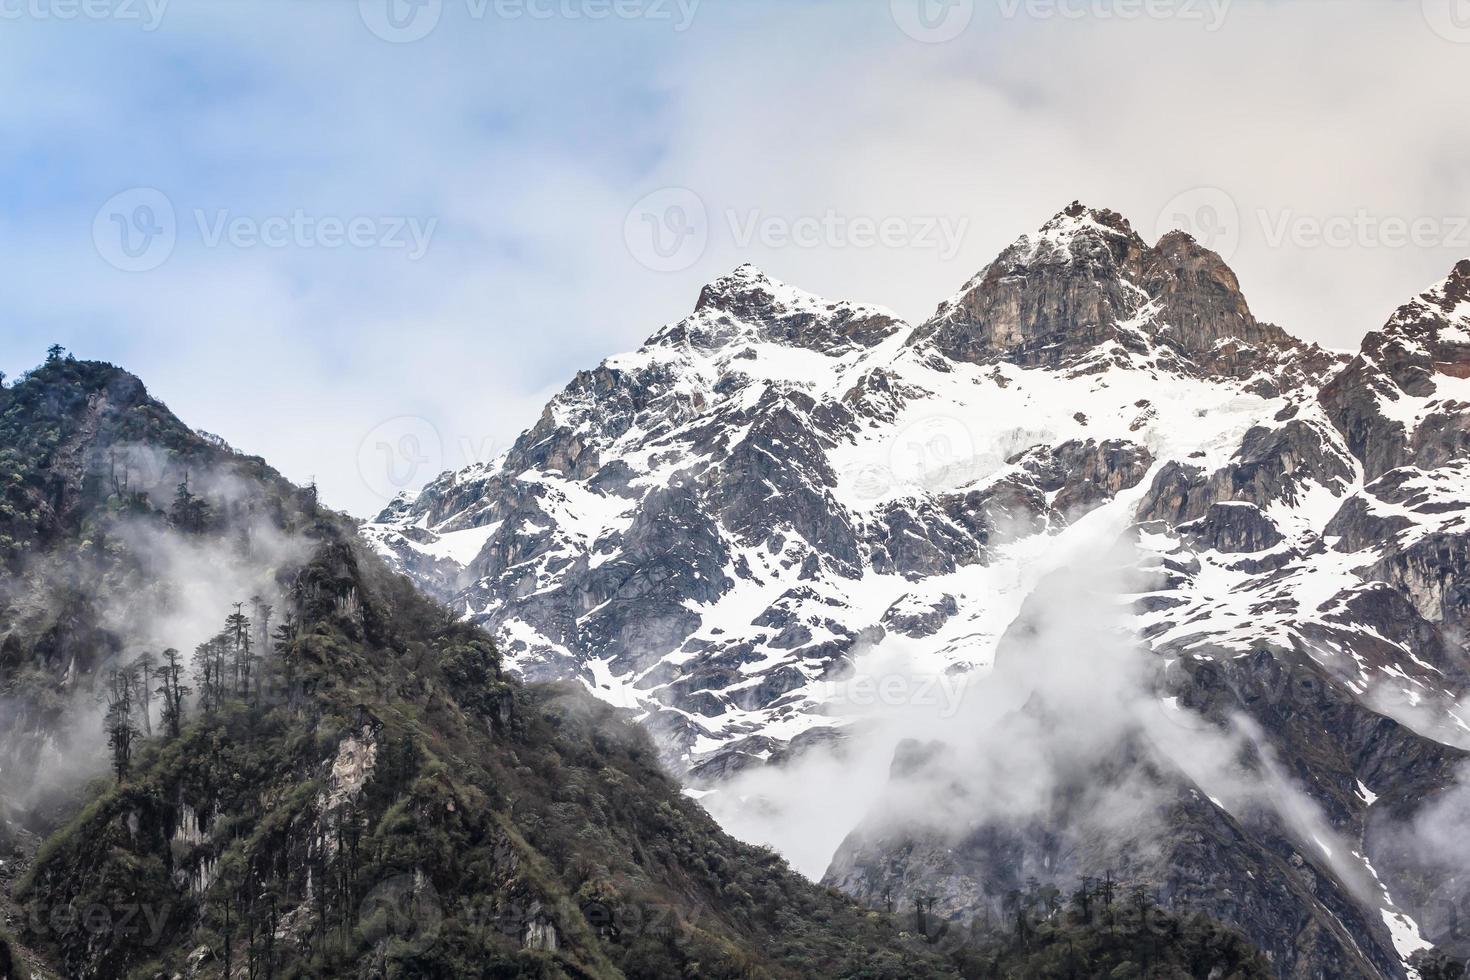 Snow mountain with fog , Lachen North Sikkim India photo